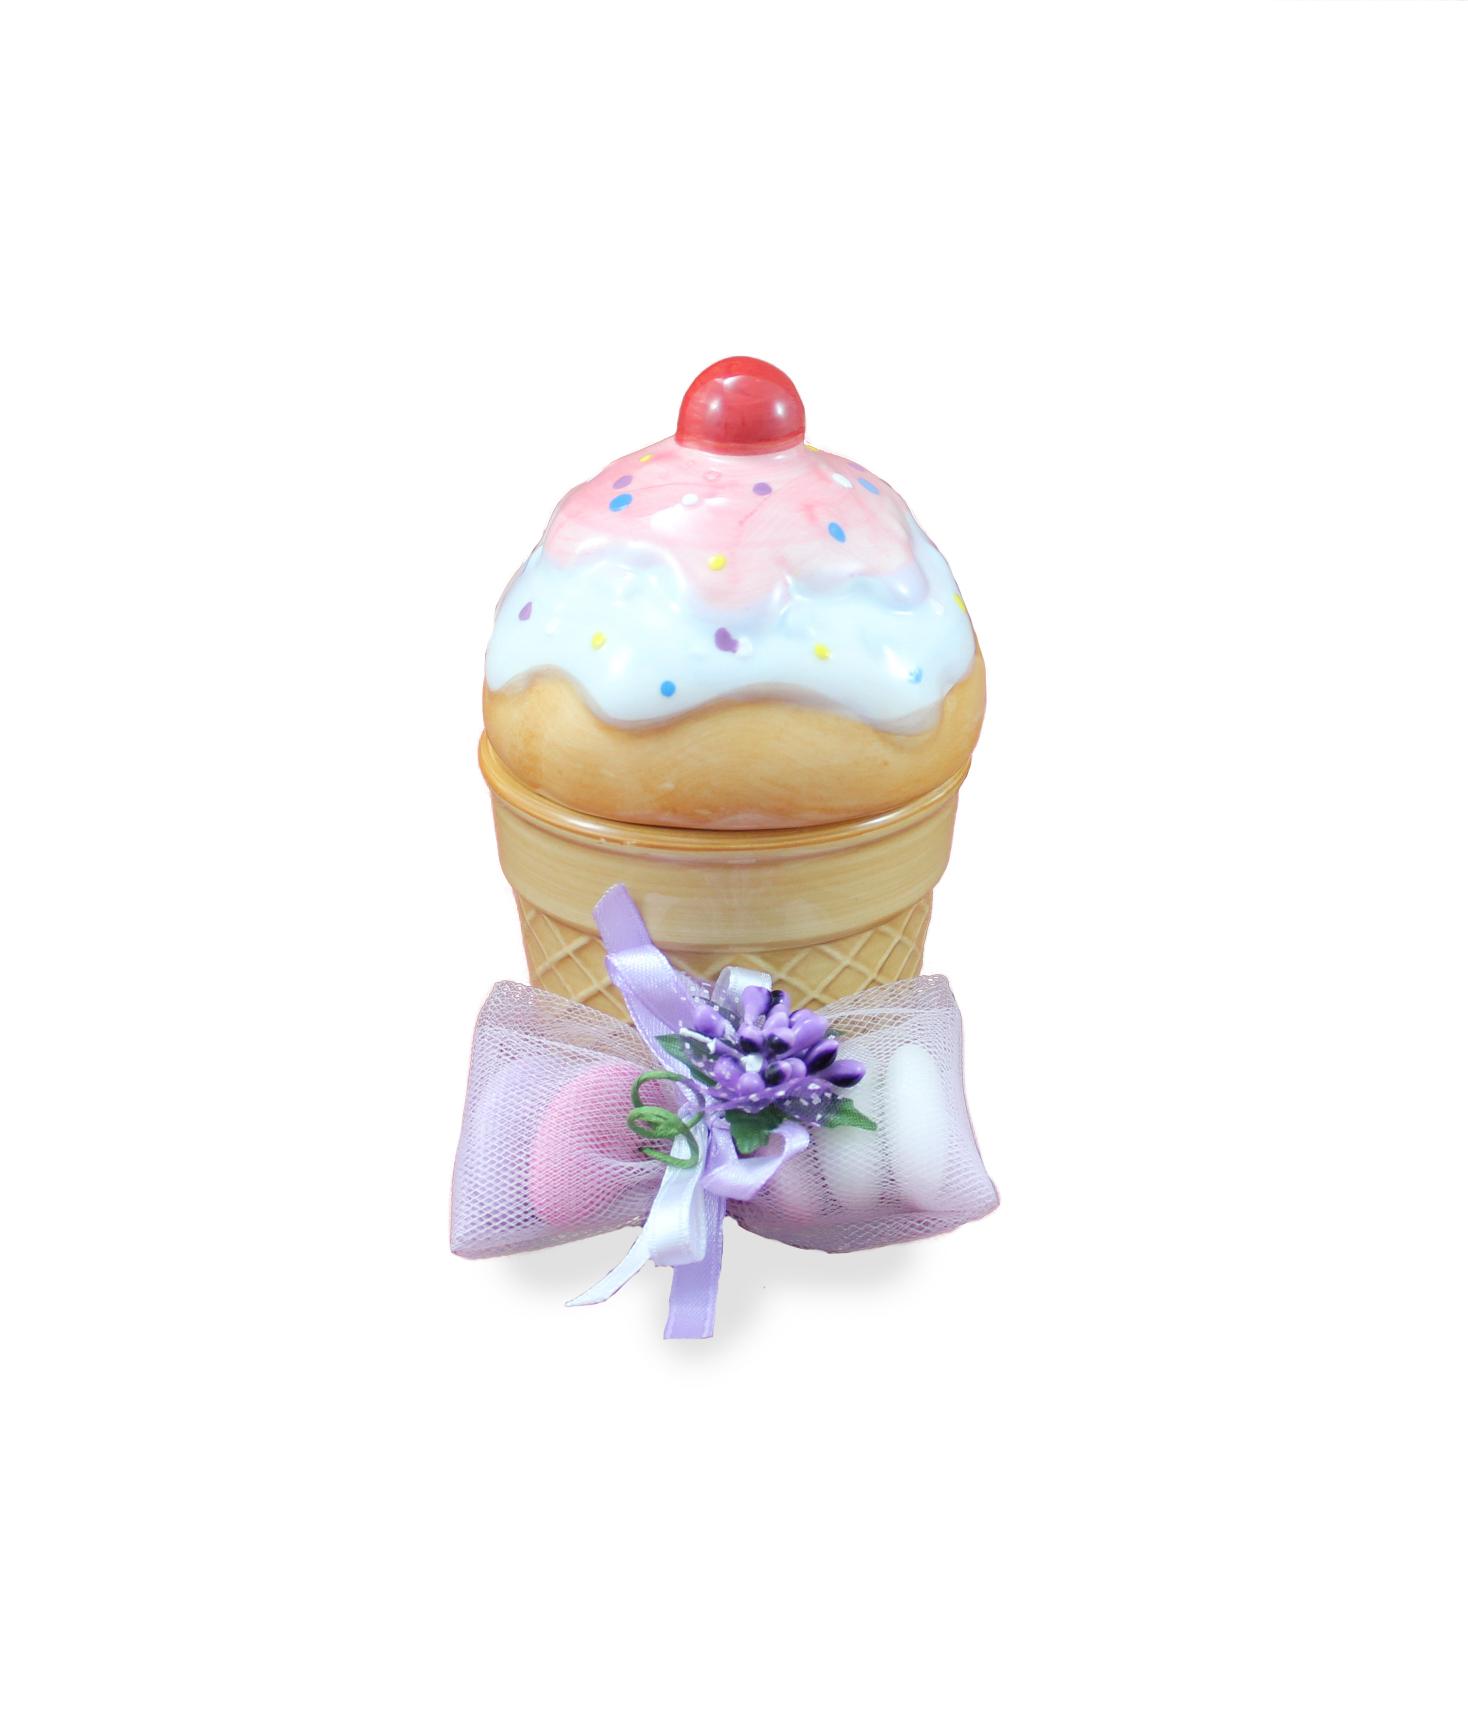 Matrimonio Tema Gelato : Bomboniera coppa gelato nonsolocerimonie